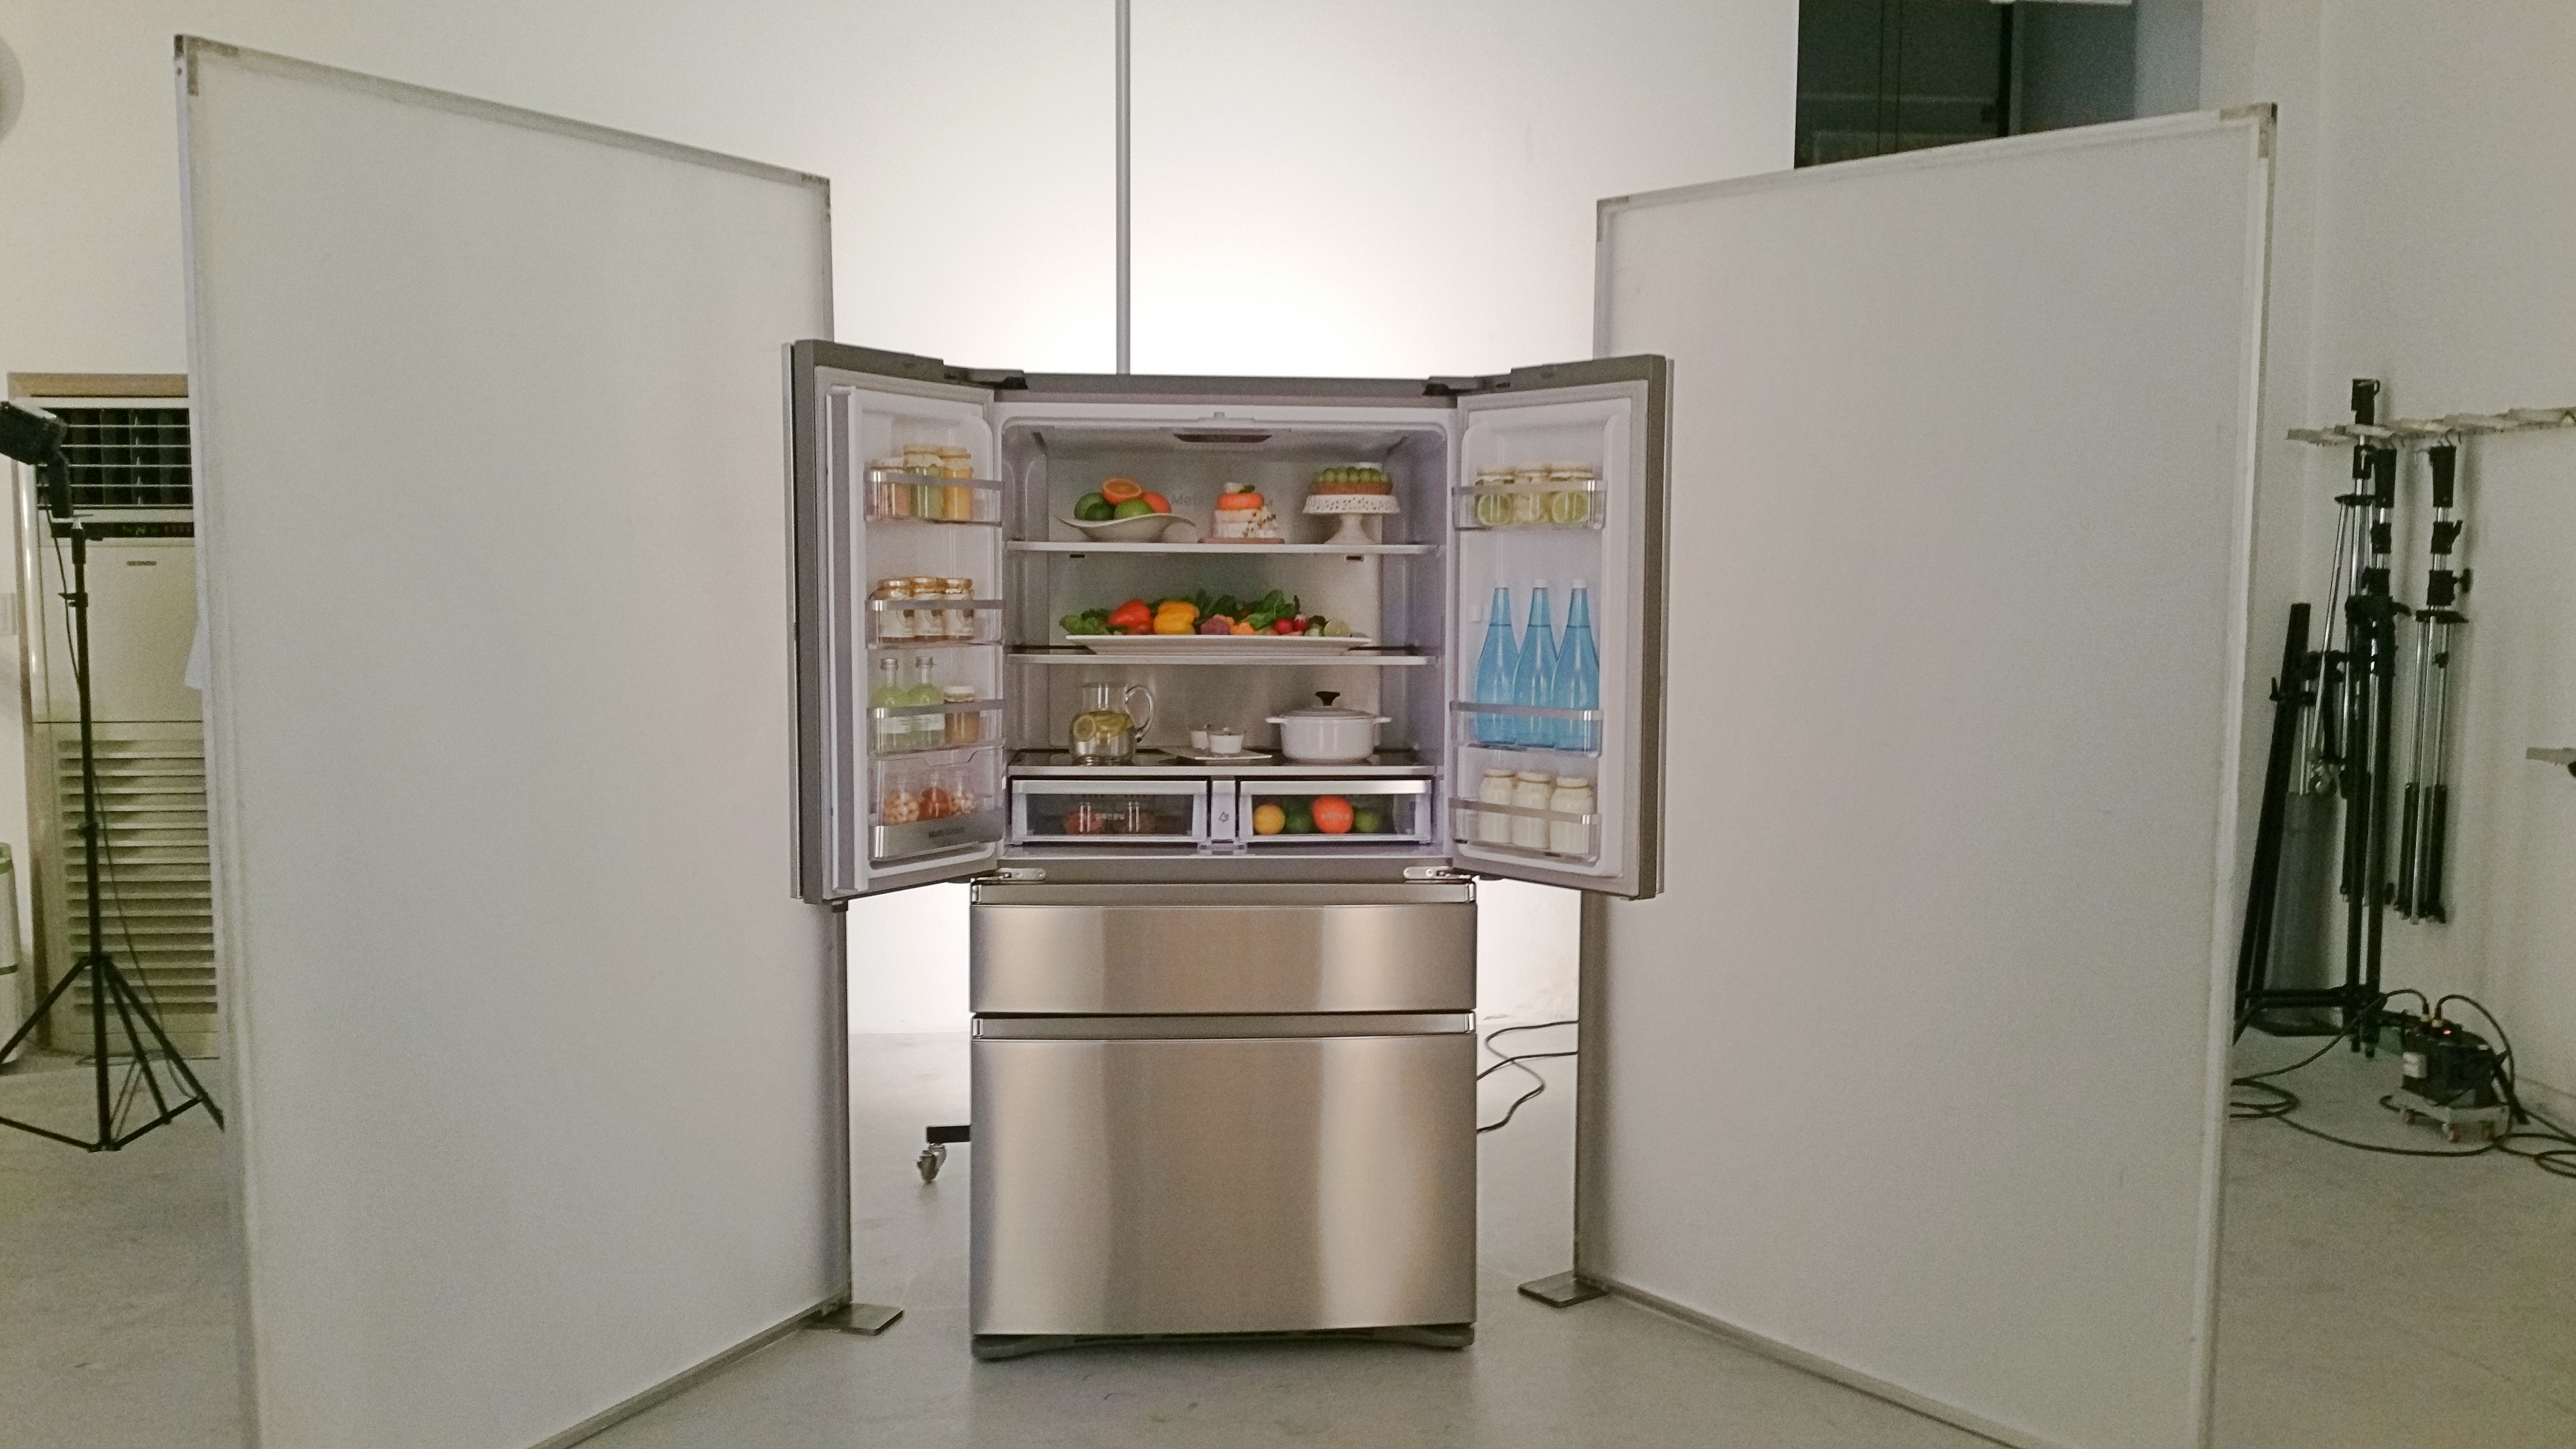 SAMSUNG 냉장고 촬영 현장